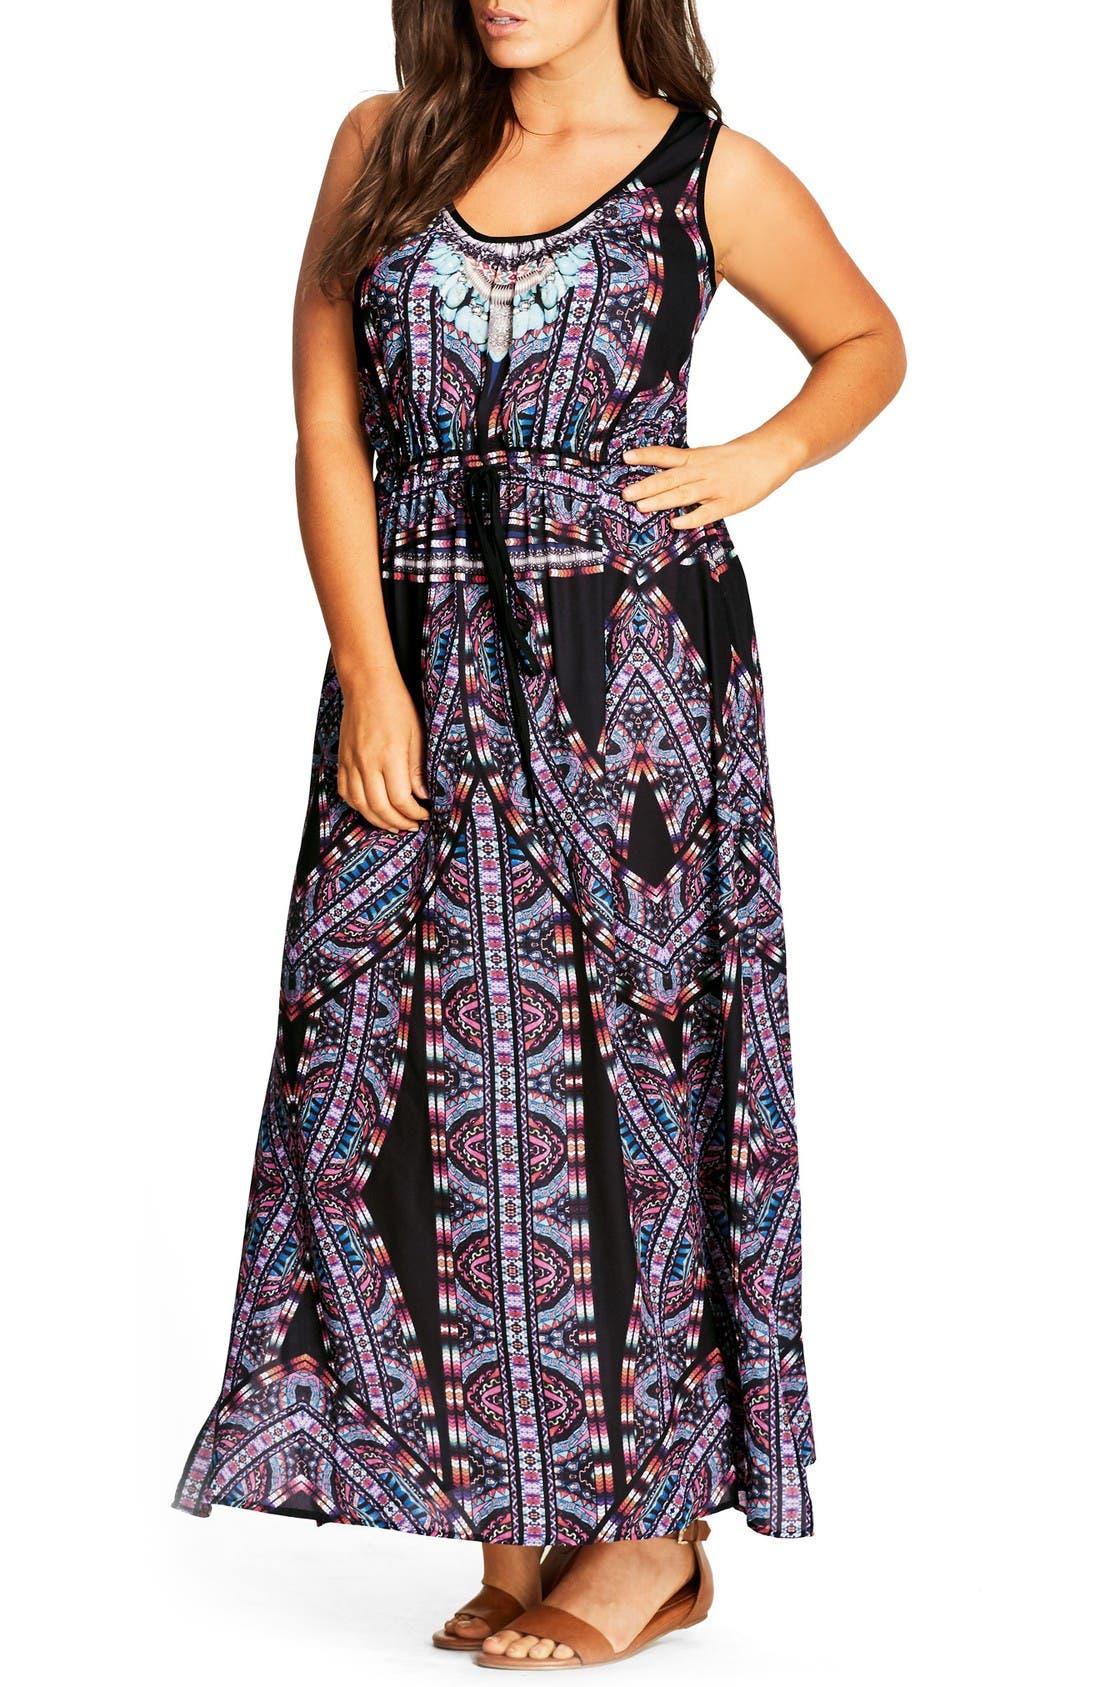 Main Image - City Chic 'Biba' Drawstring Maxi Dress (Plus Size)